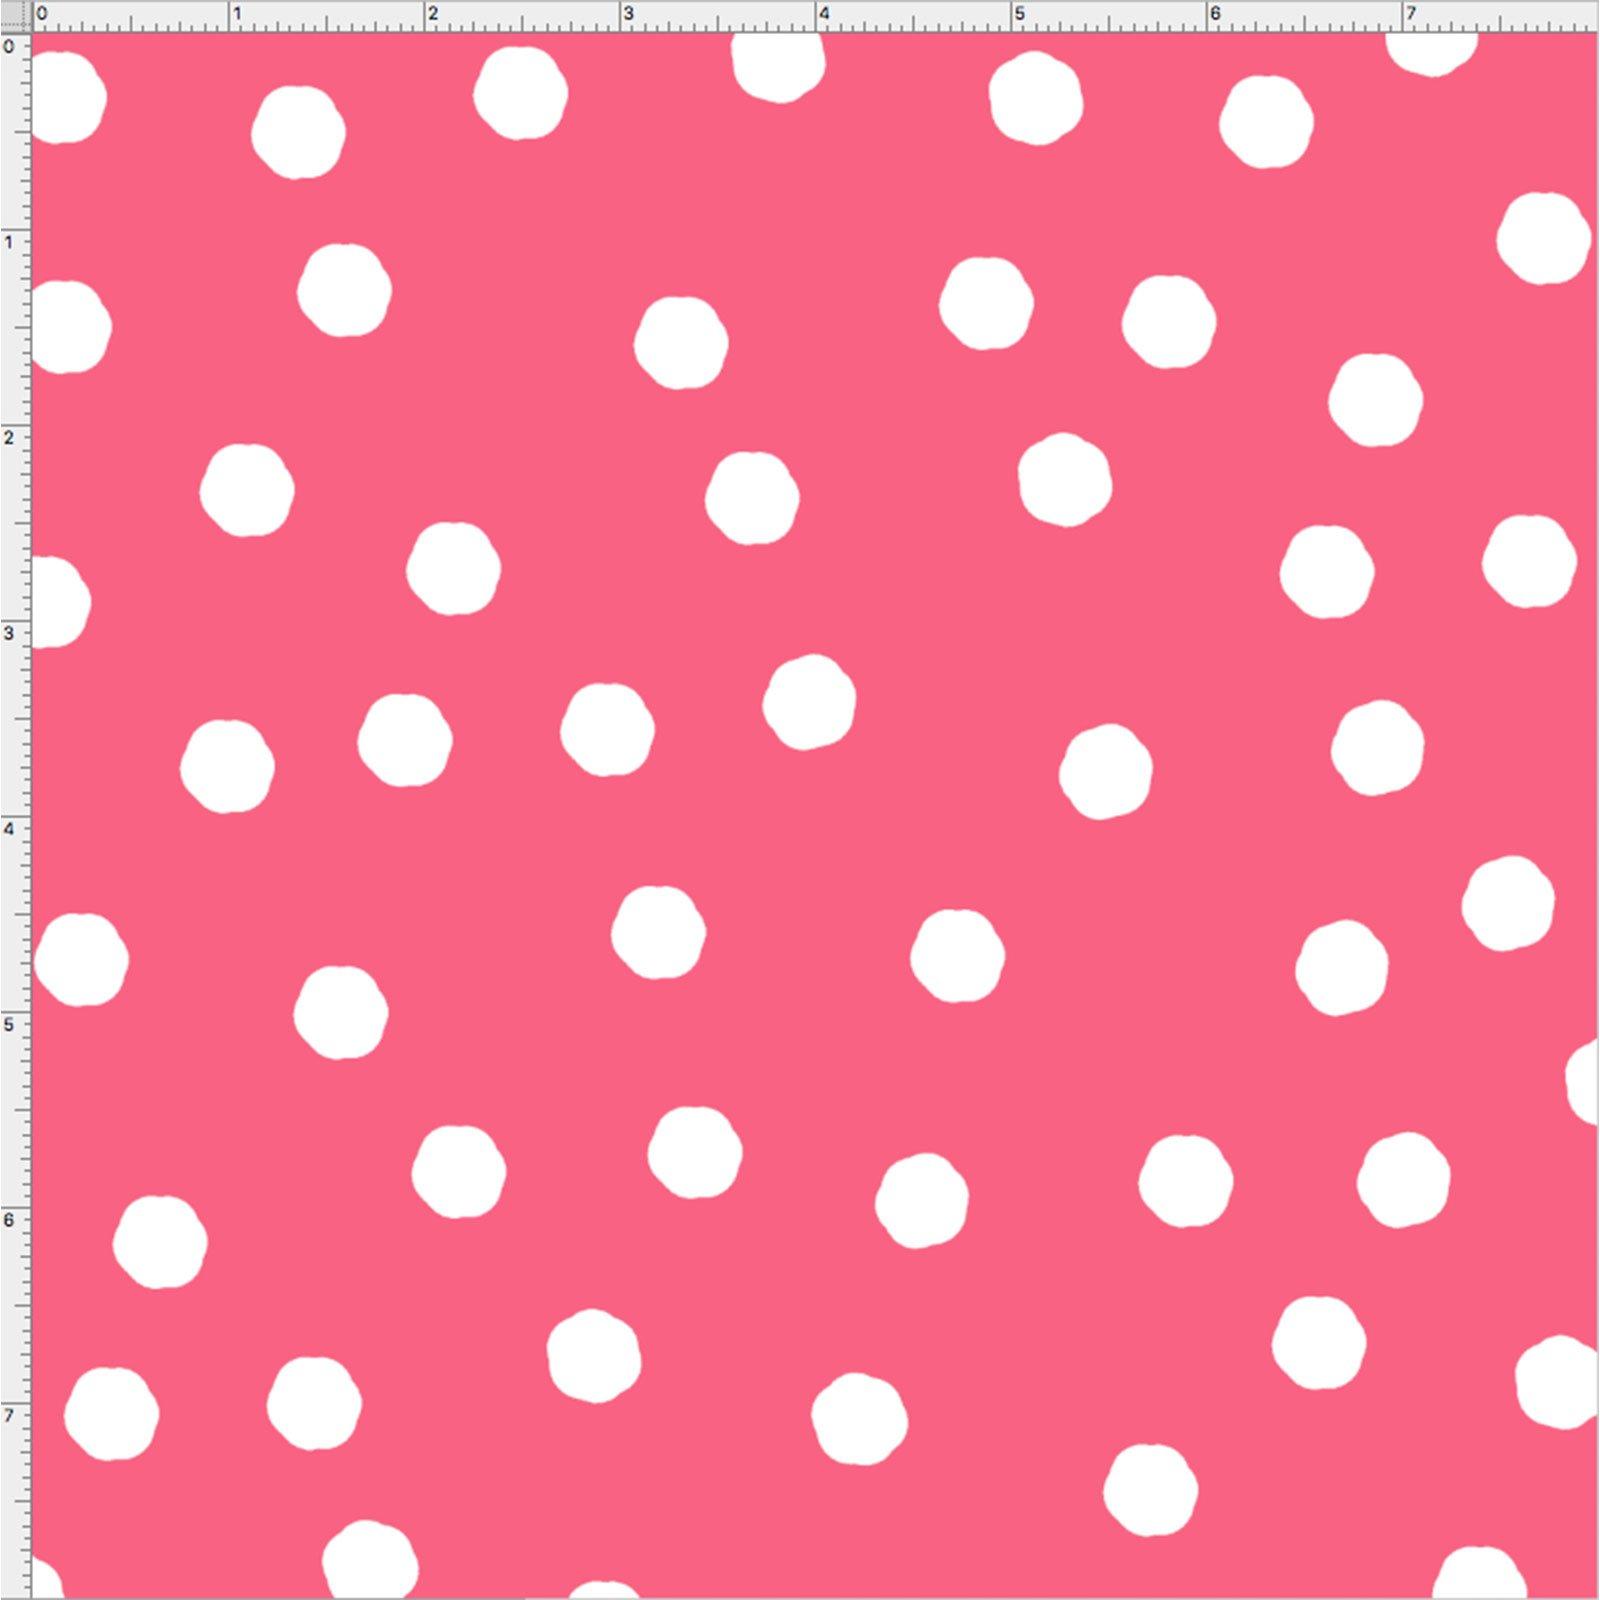 【Loralie Designs】-Jumbo Dots -  (ULH-127) ピンク